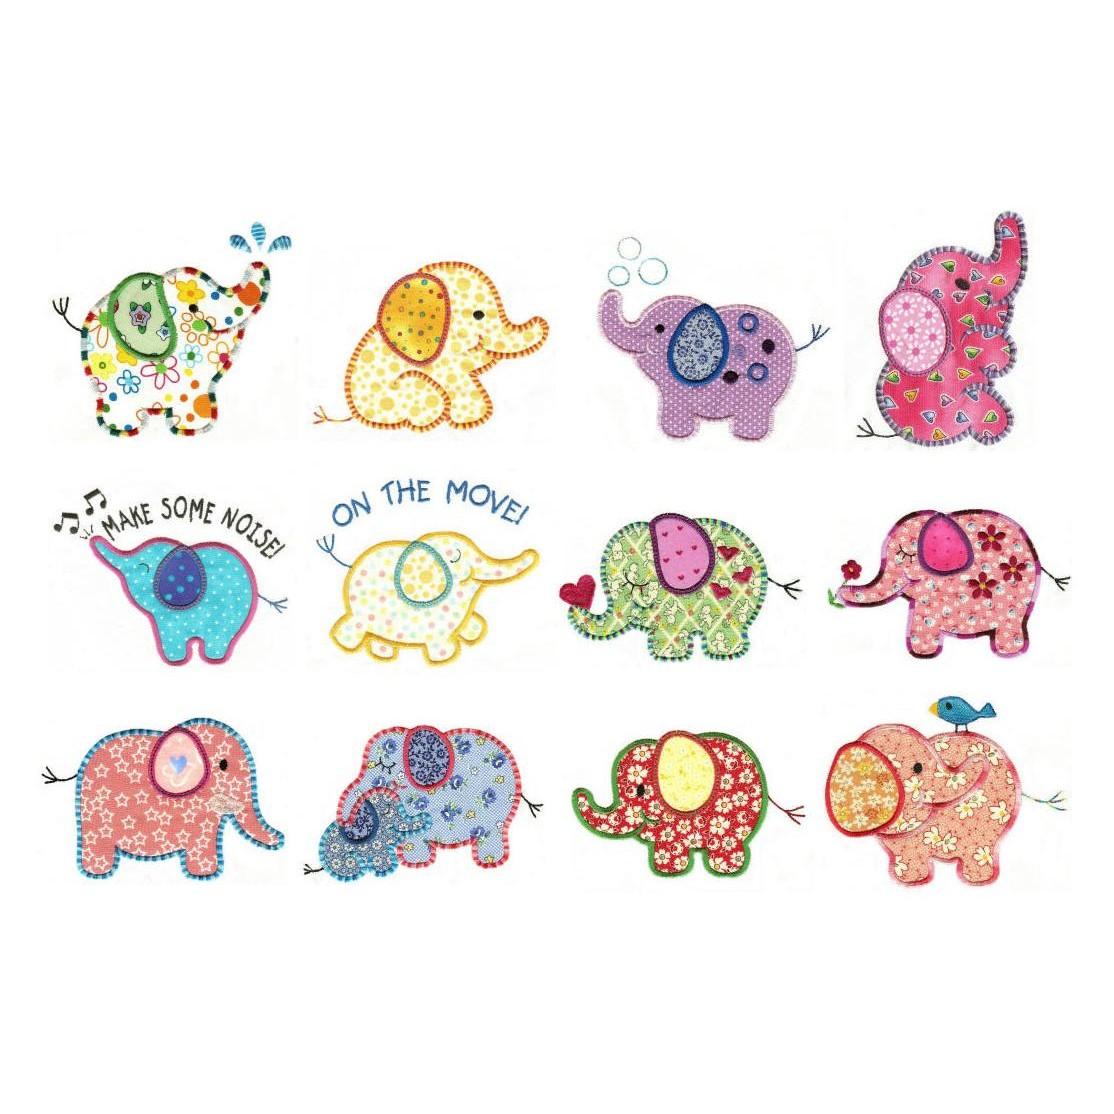 Cute Elephant Wallpapers Tumblr Wallpapersafari